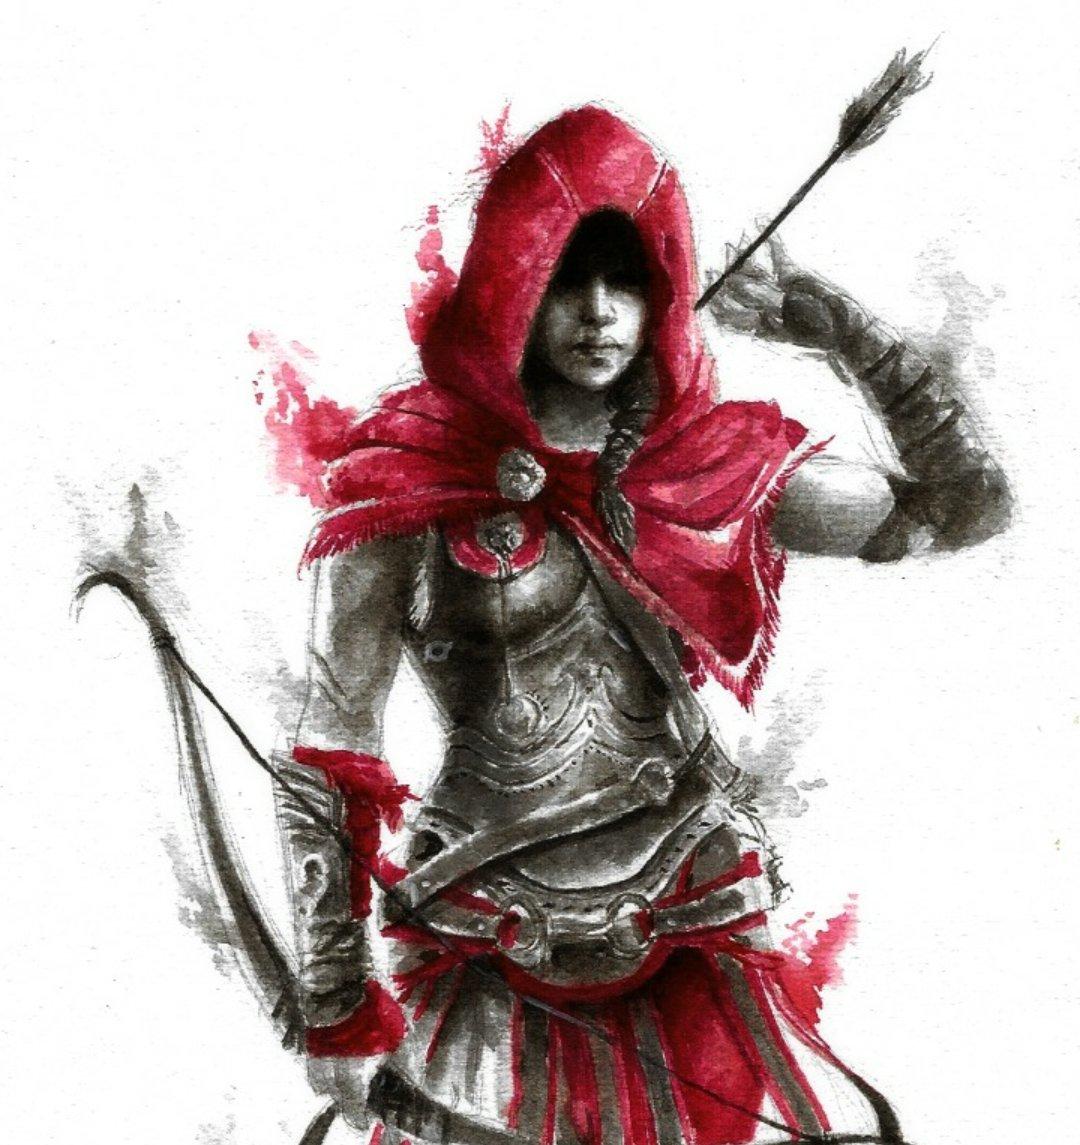 Assassins Creed Odyssey Kassandra Assassins Creed Tattoo Assassins Creed Art Assassins Creed Odyssey